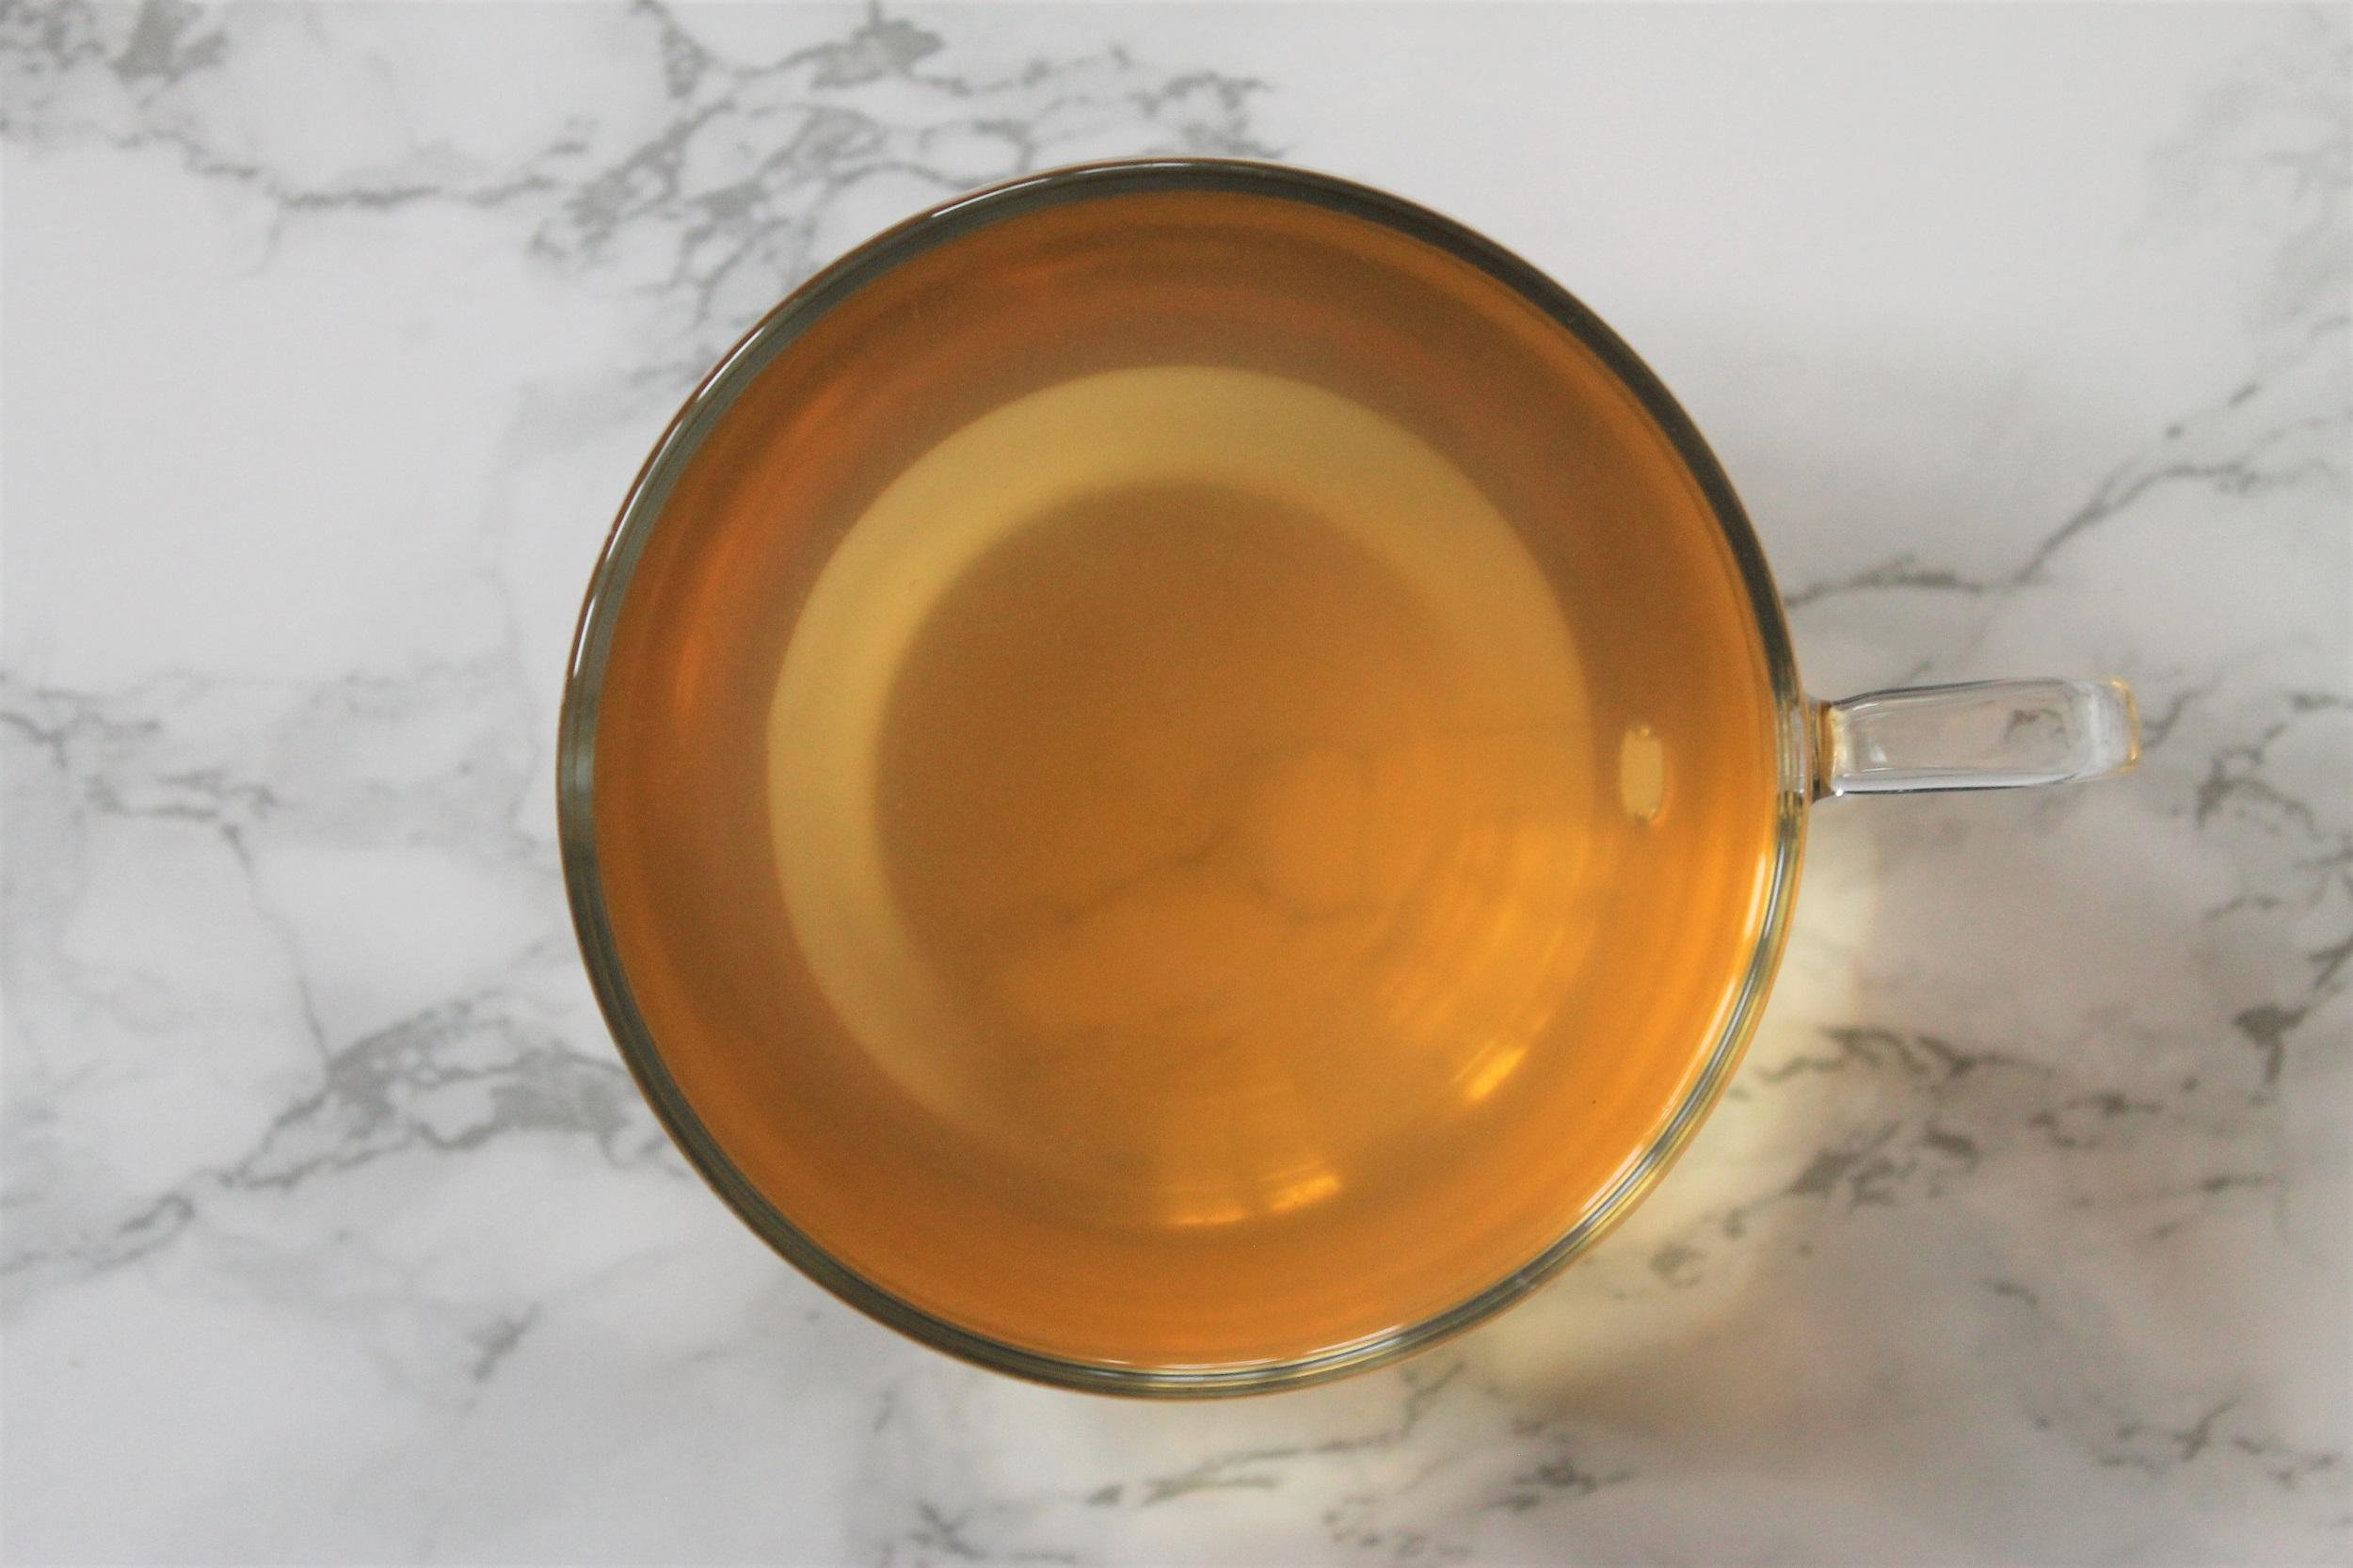 fresh apple tea in teacup